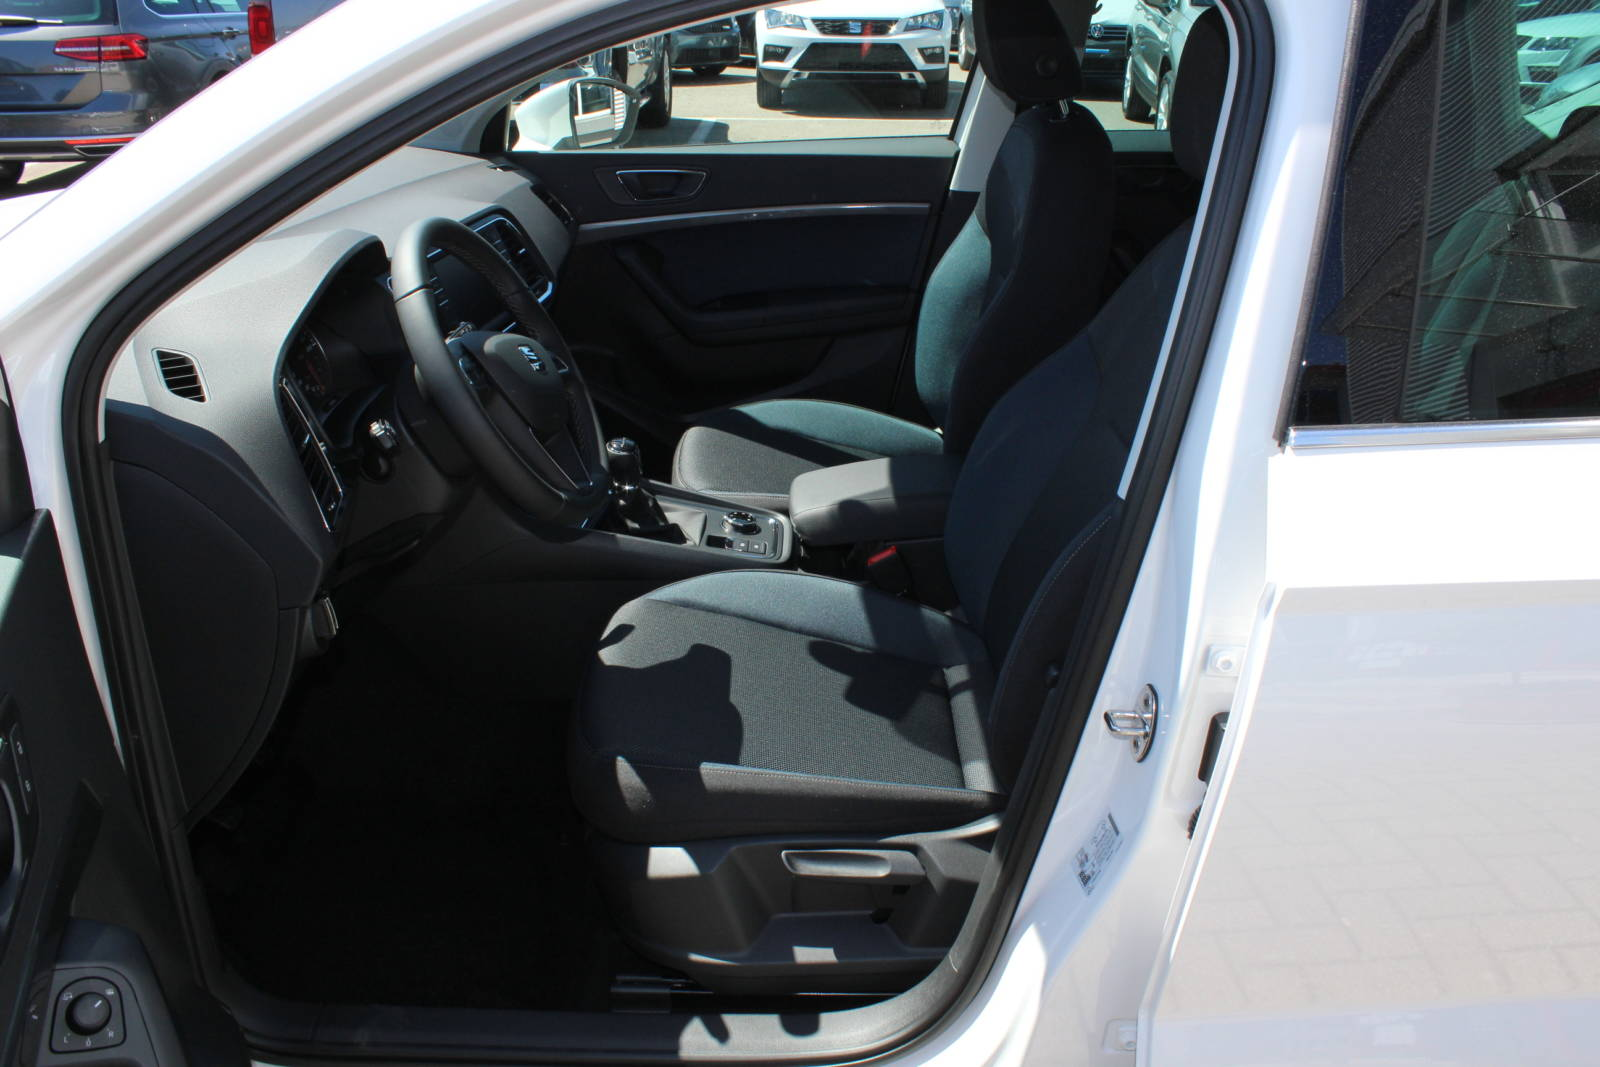 Seat Ateca Style 2.0 TDI 6-Gang 4 x 4 / Deutsche Neufahrzeuge und EU-Neufahrzeuge – Aha! Fahrzeughandel GmbH in Althengstett